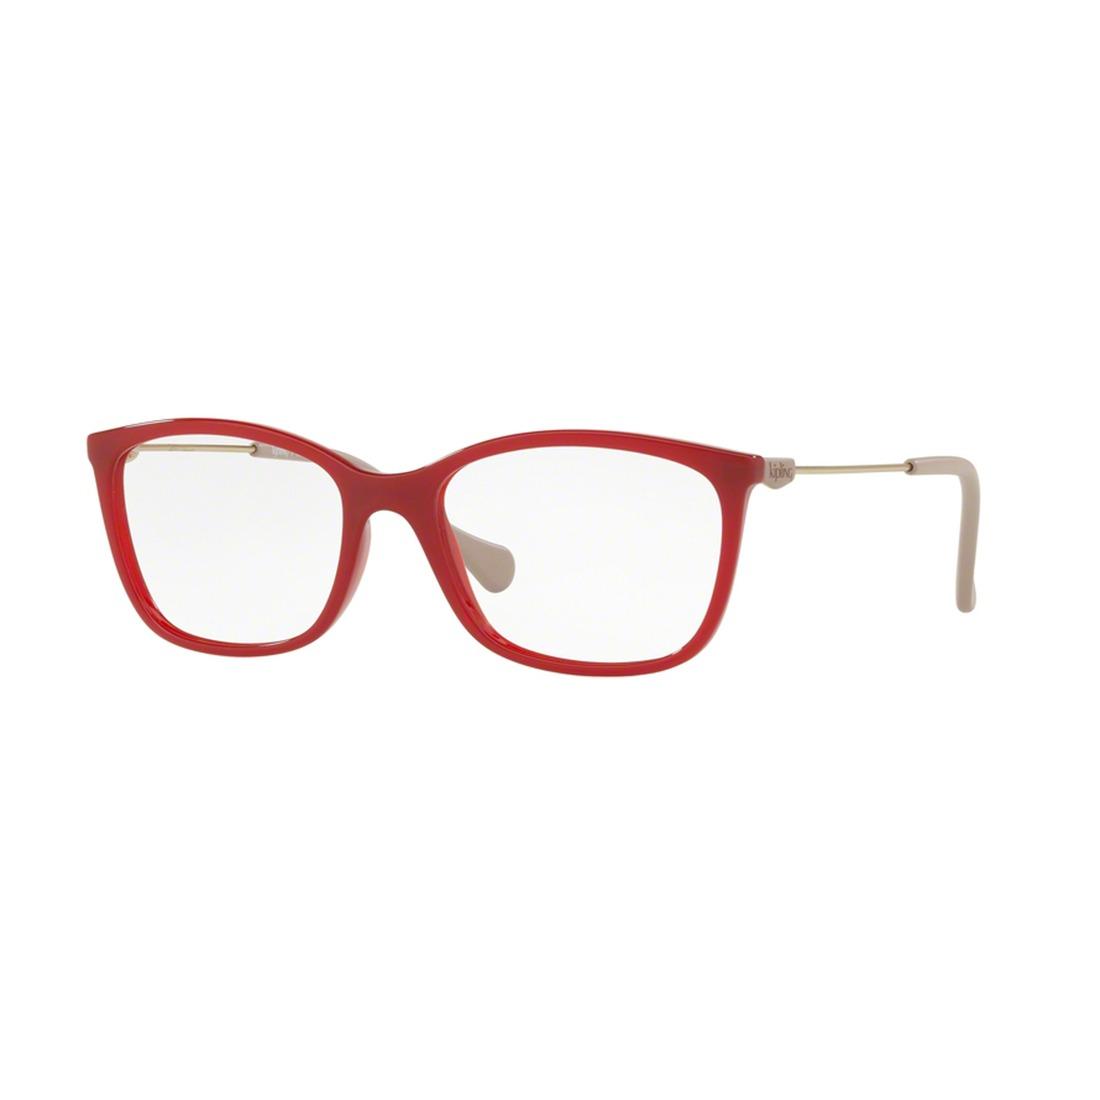 c53d18698 Kipling Kp 3105 Óculos De Grau - R$ 317,60 em Mercado Livre